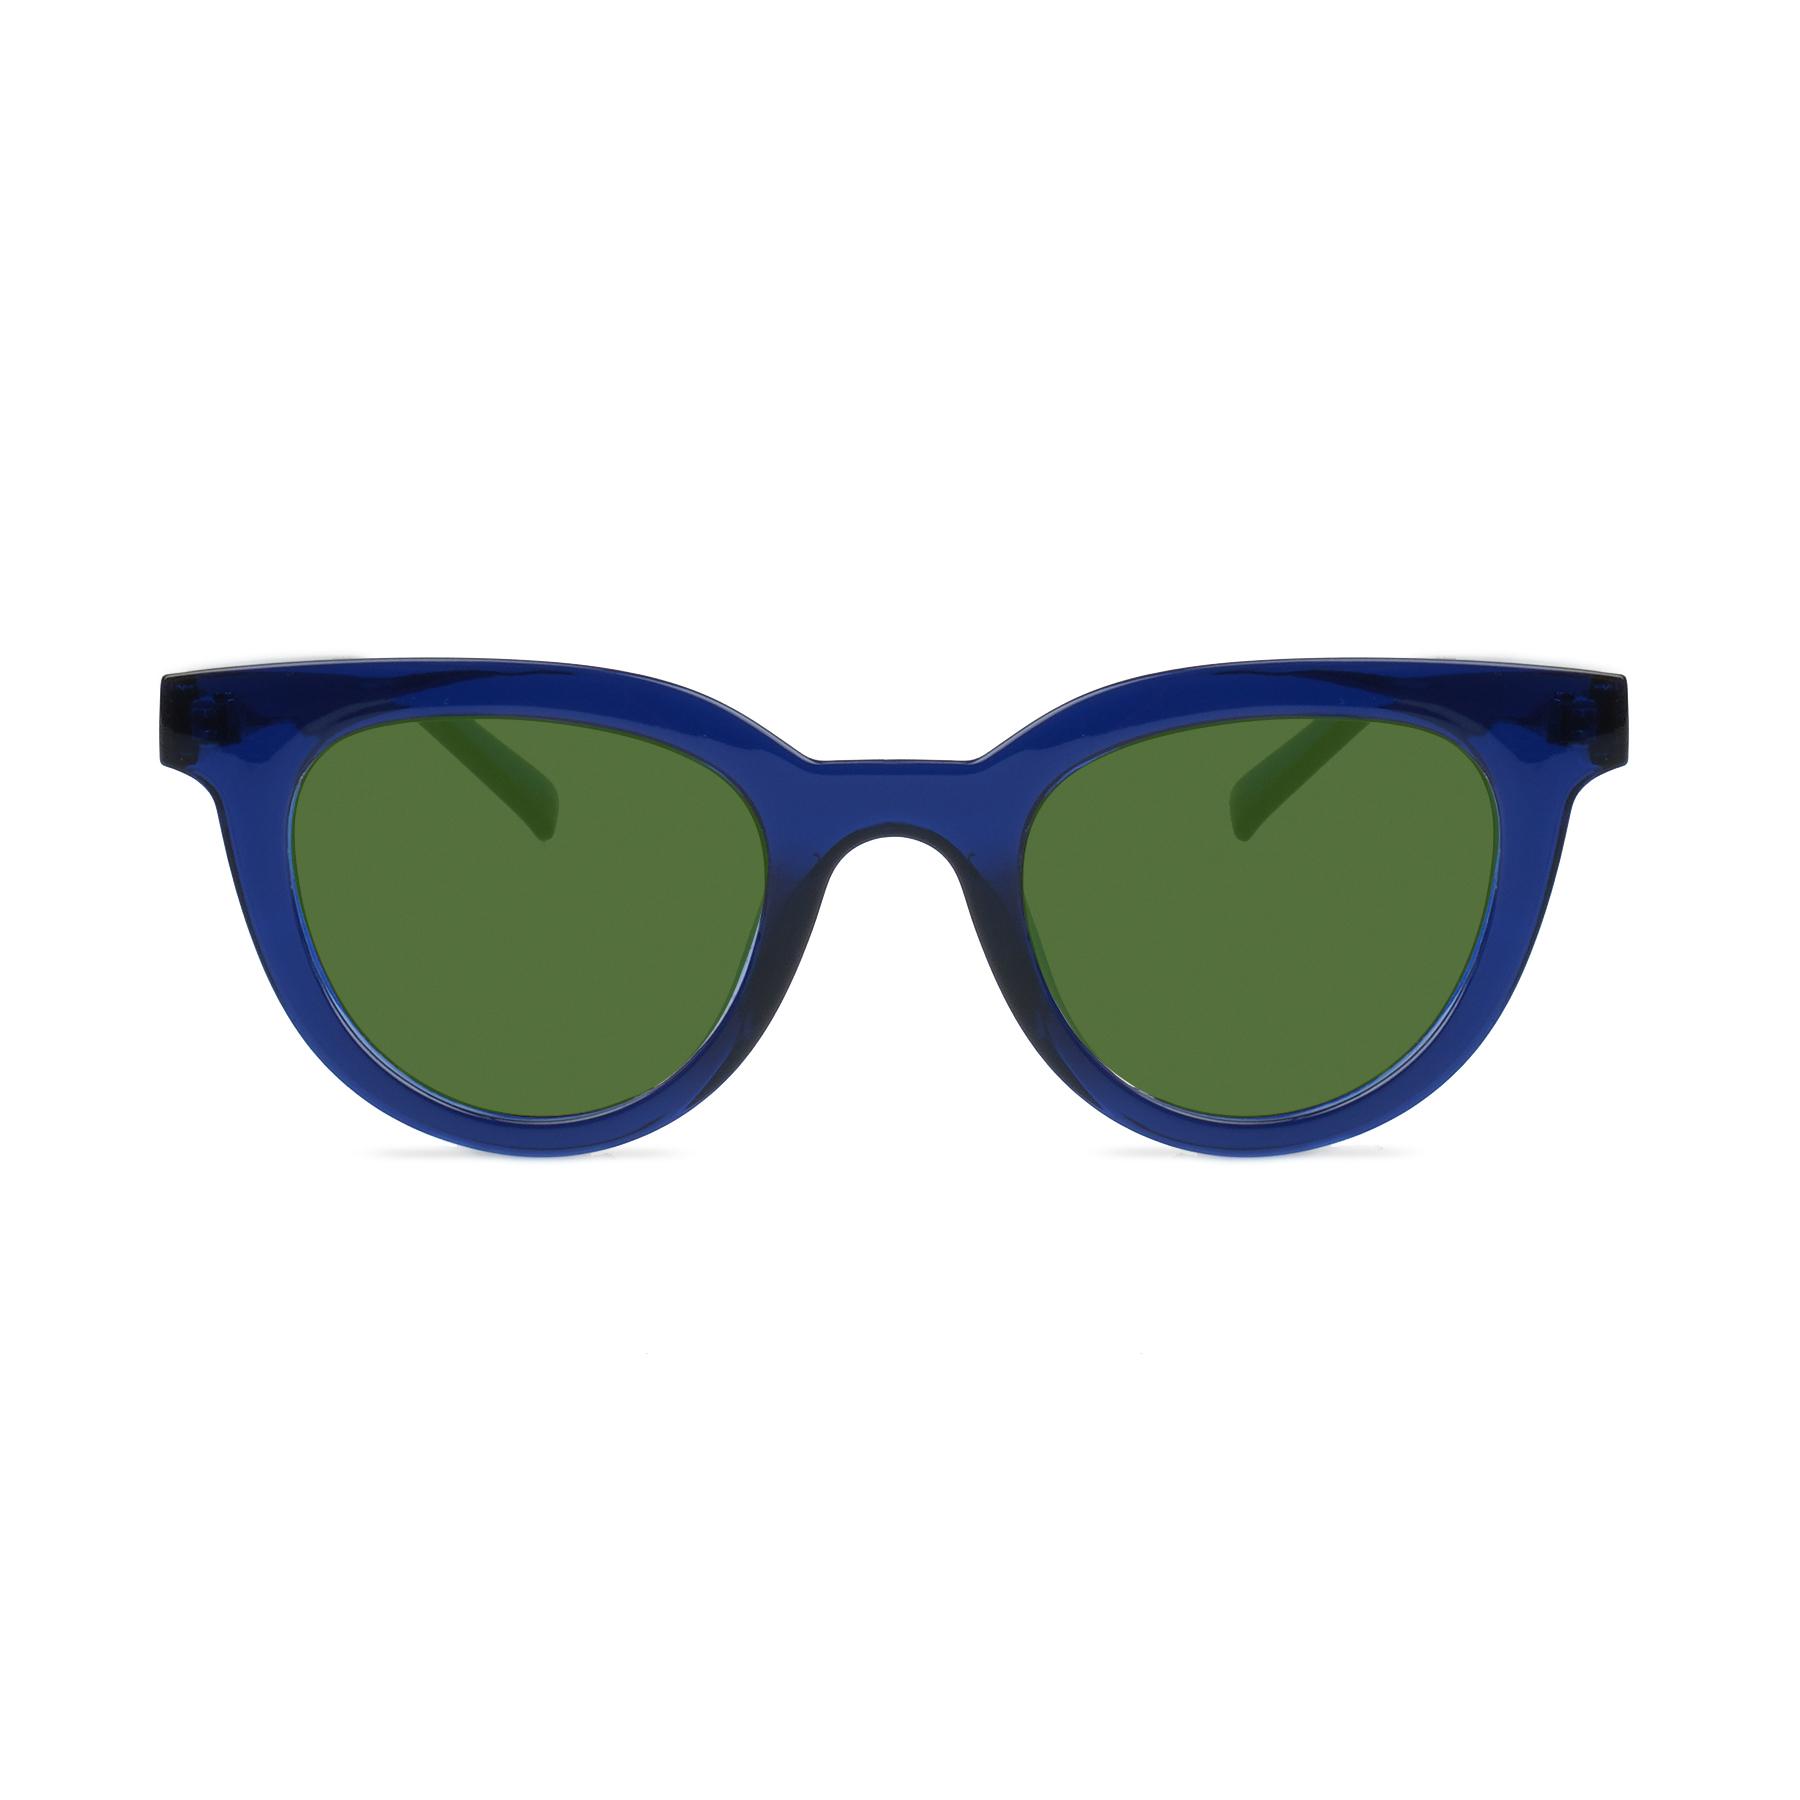 Evoke Amsterdam Sunglasses